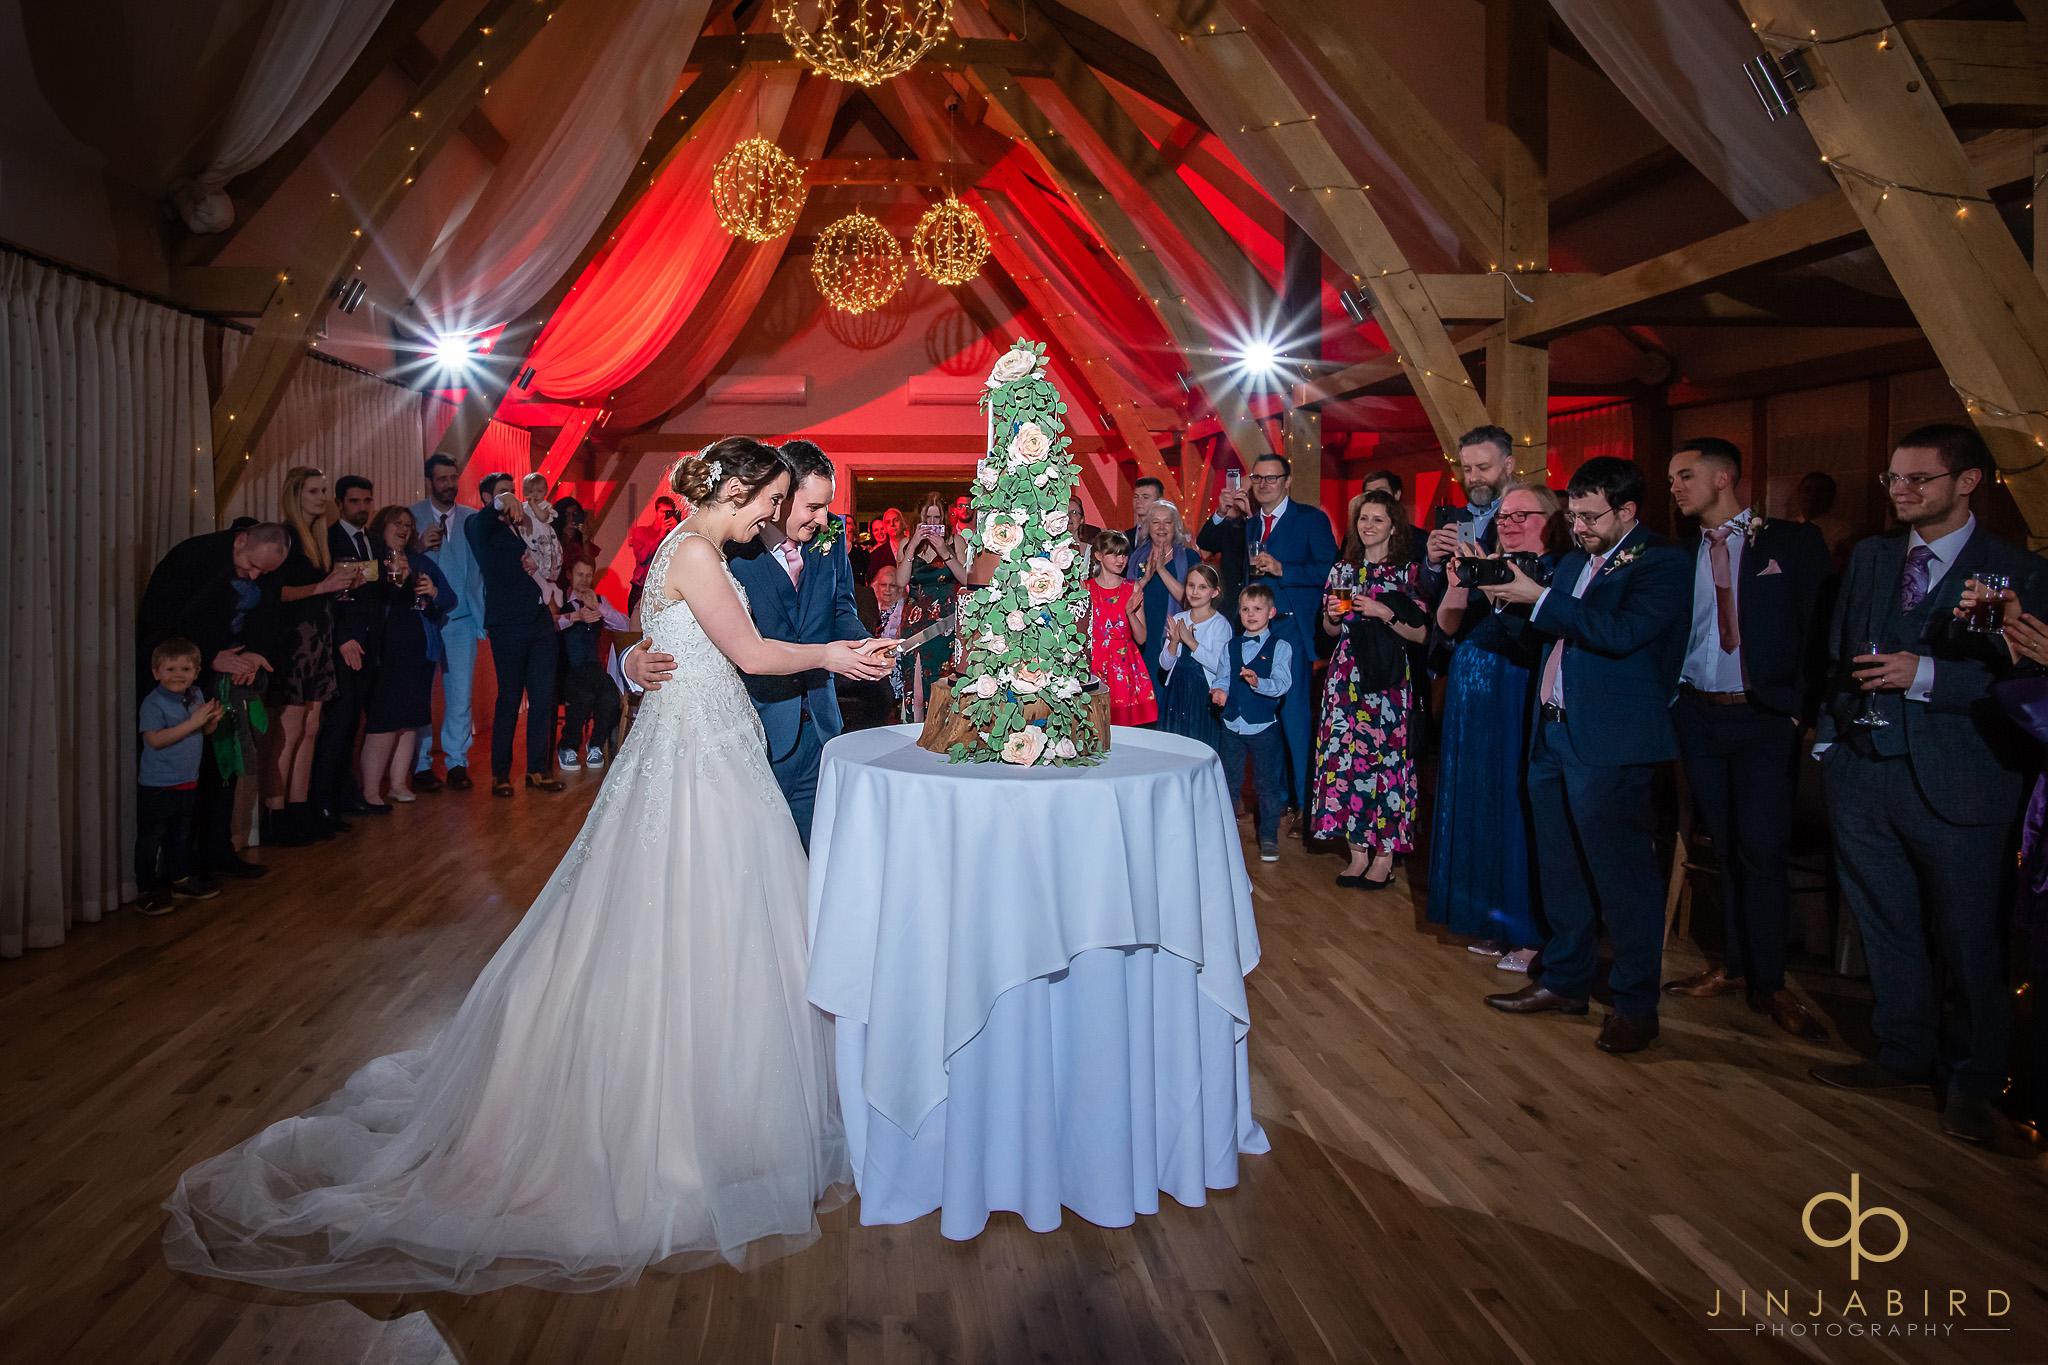 bride with groom cutting wedding cake